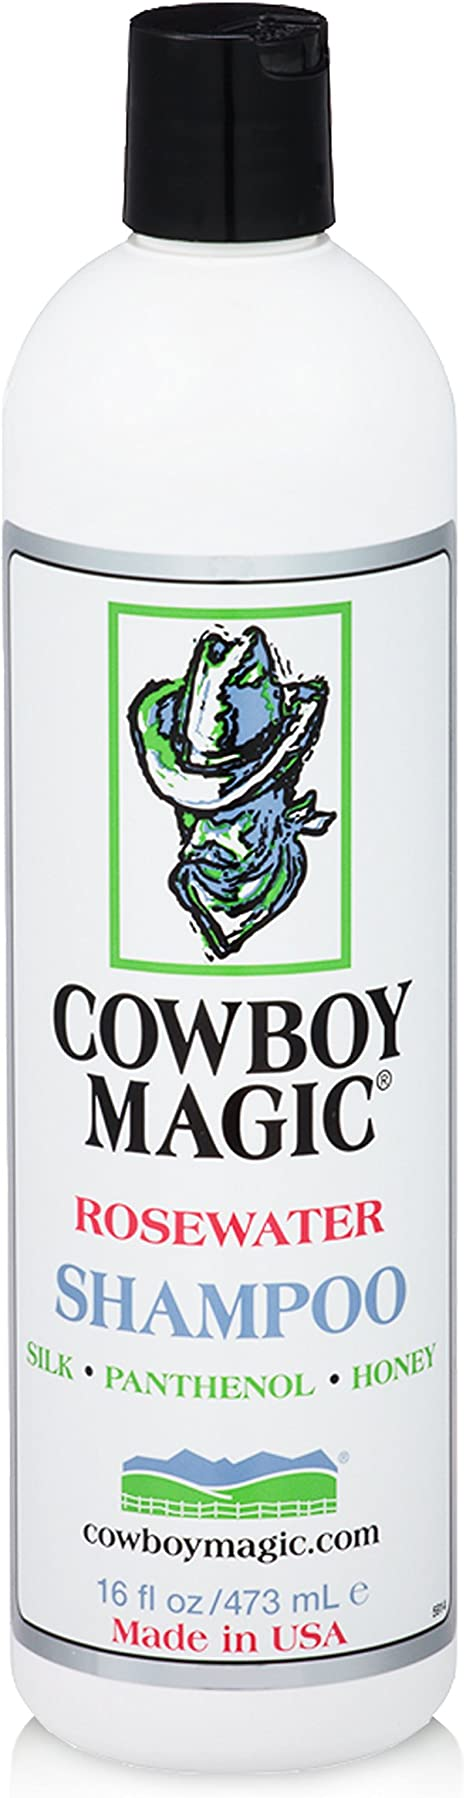 Cowboy Magic Grooming Rosewater Shampoo